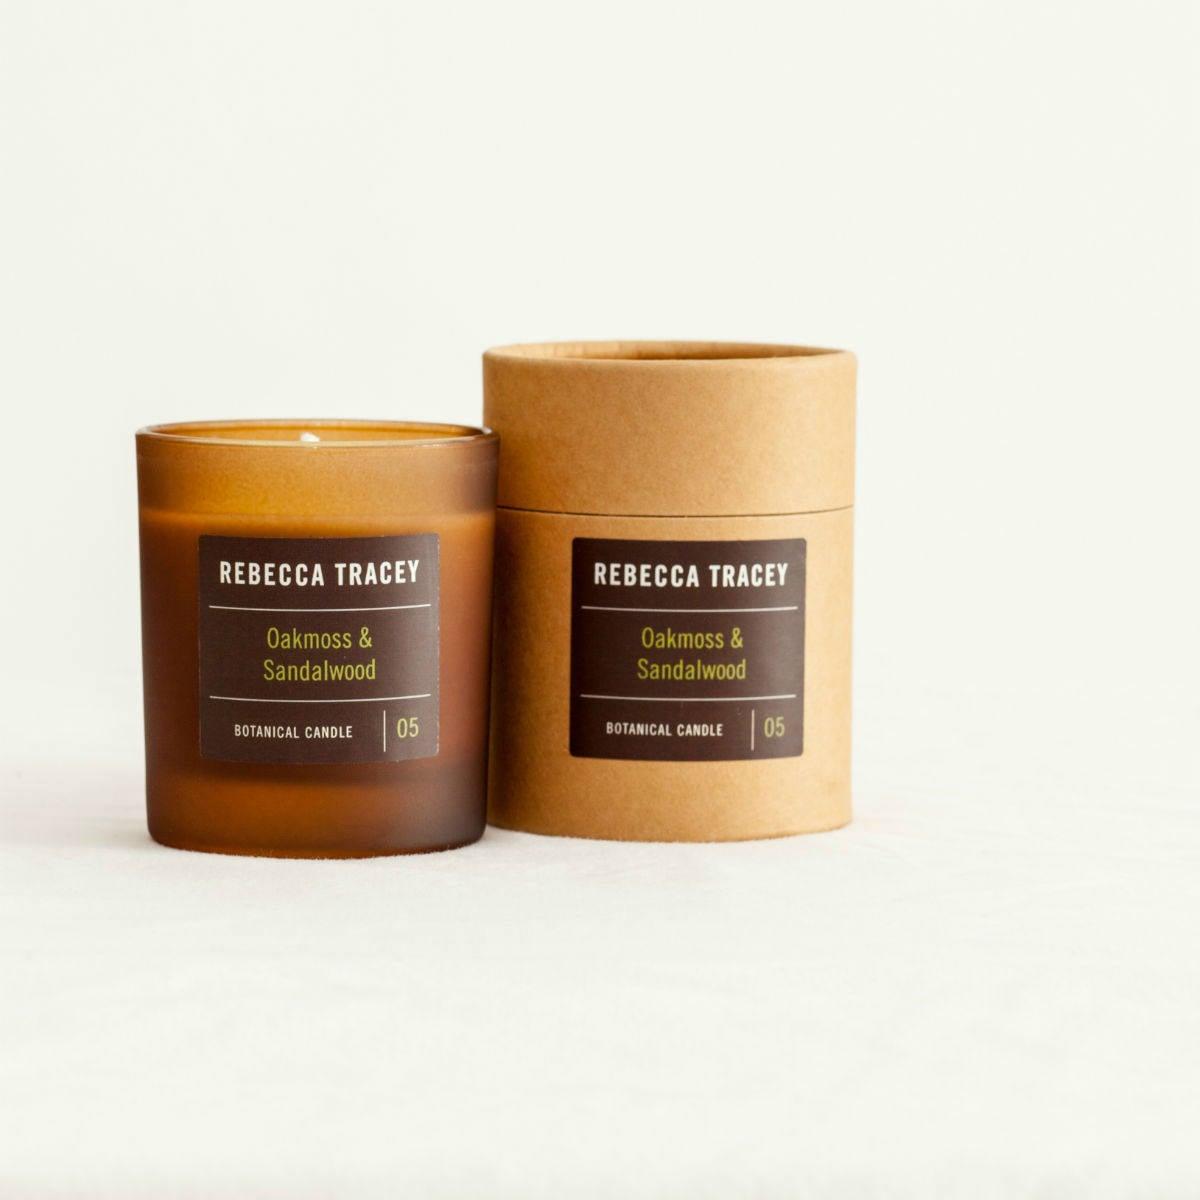 Rebecca Tracey Oakmoss and Sandlewood Botanical Candle | Restoration Yard